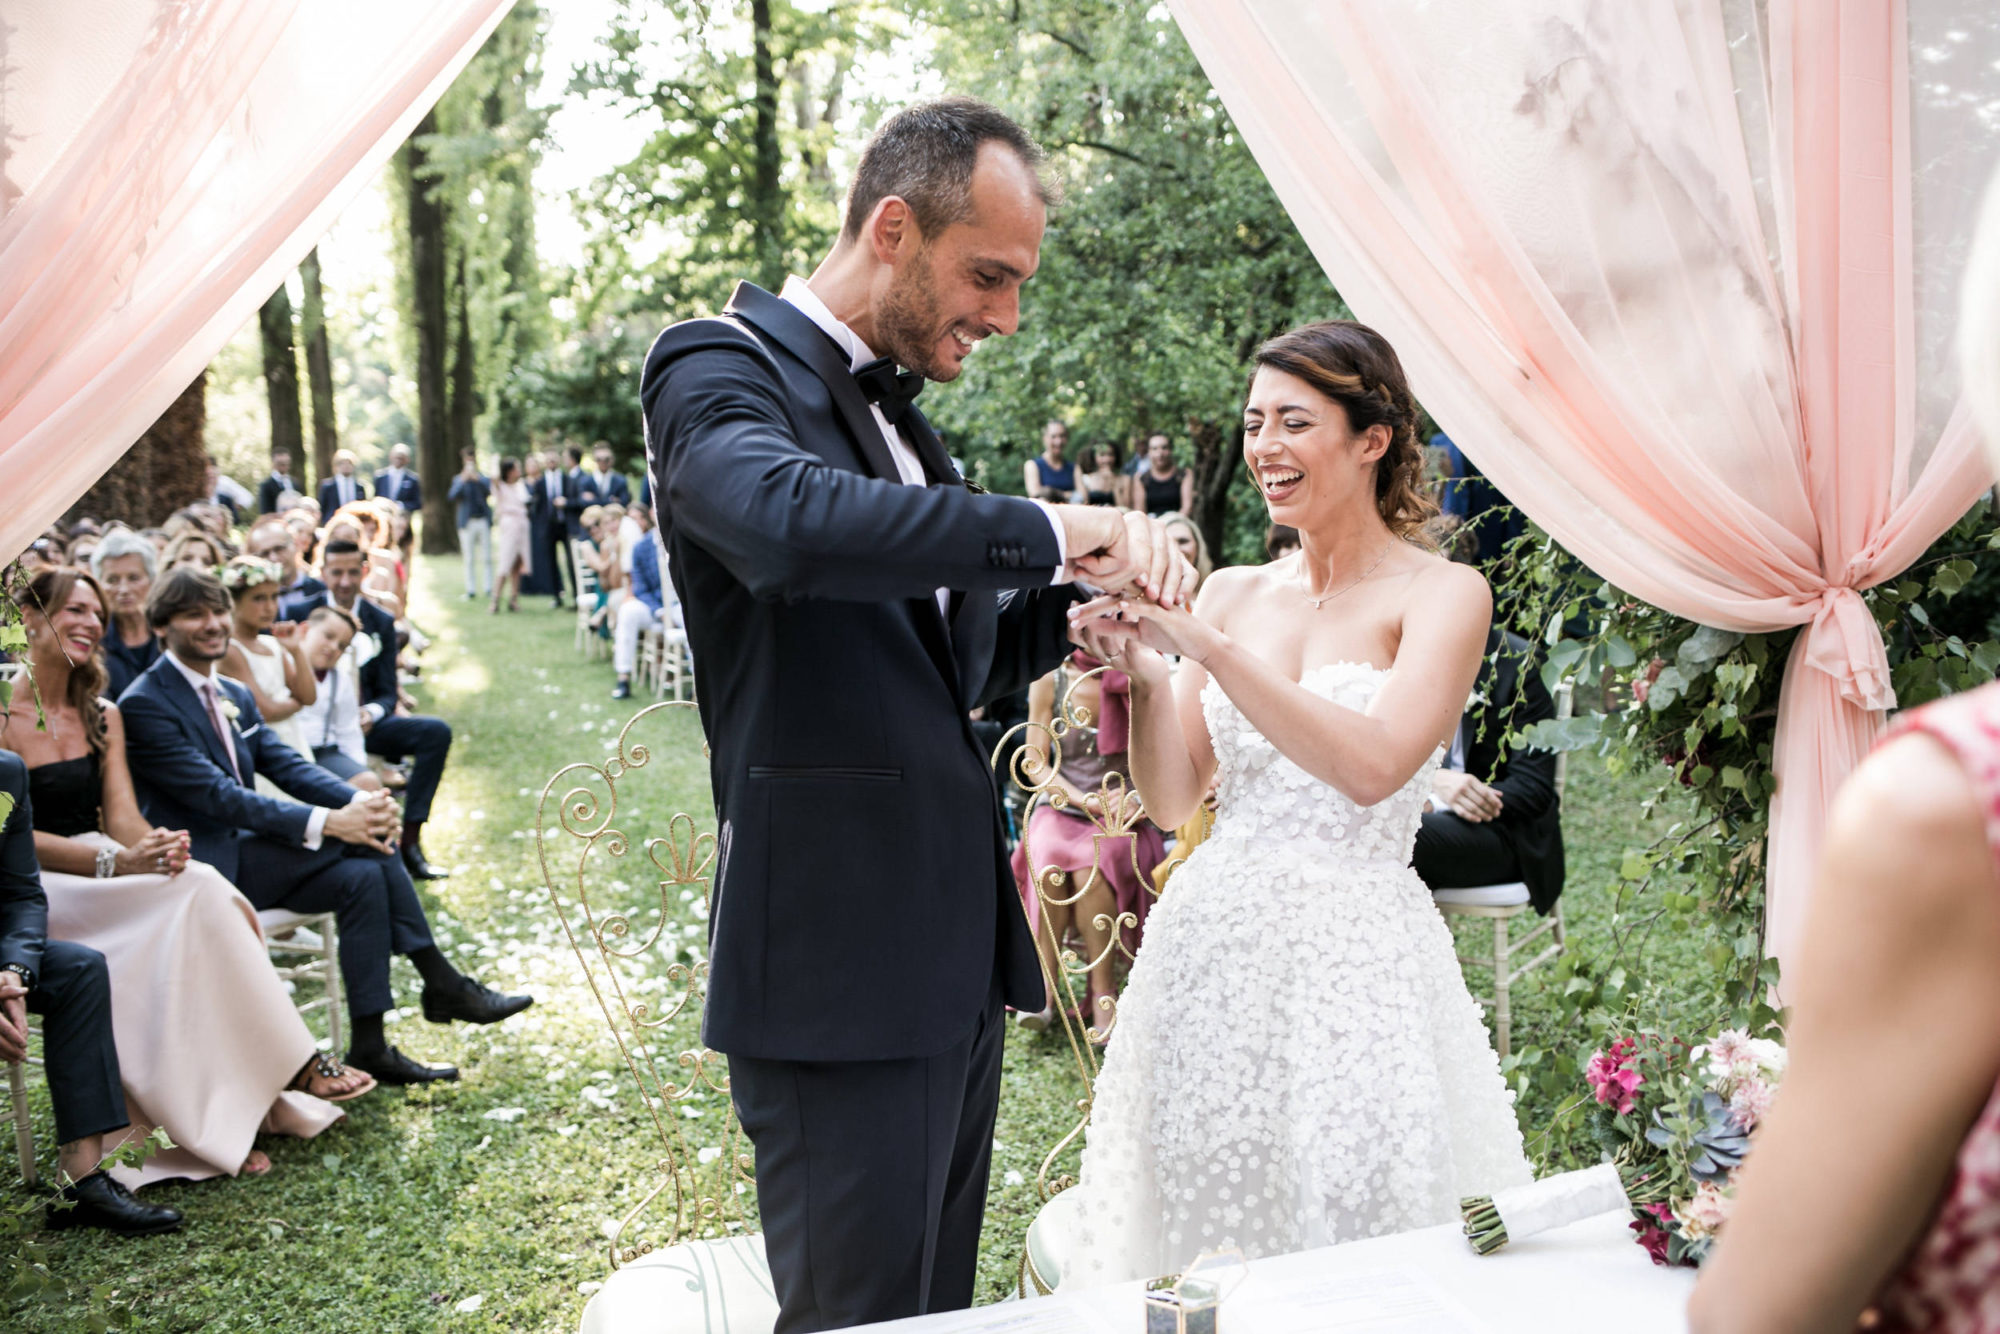 matrimonio_villa-ferrari-gussola_MI-053